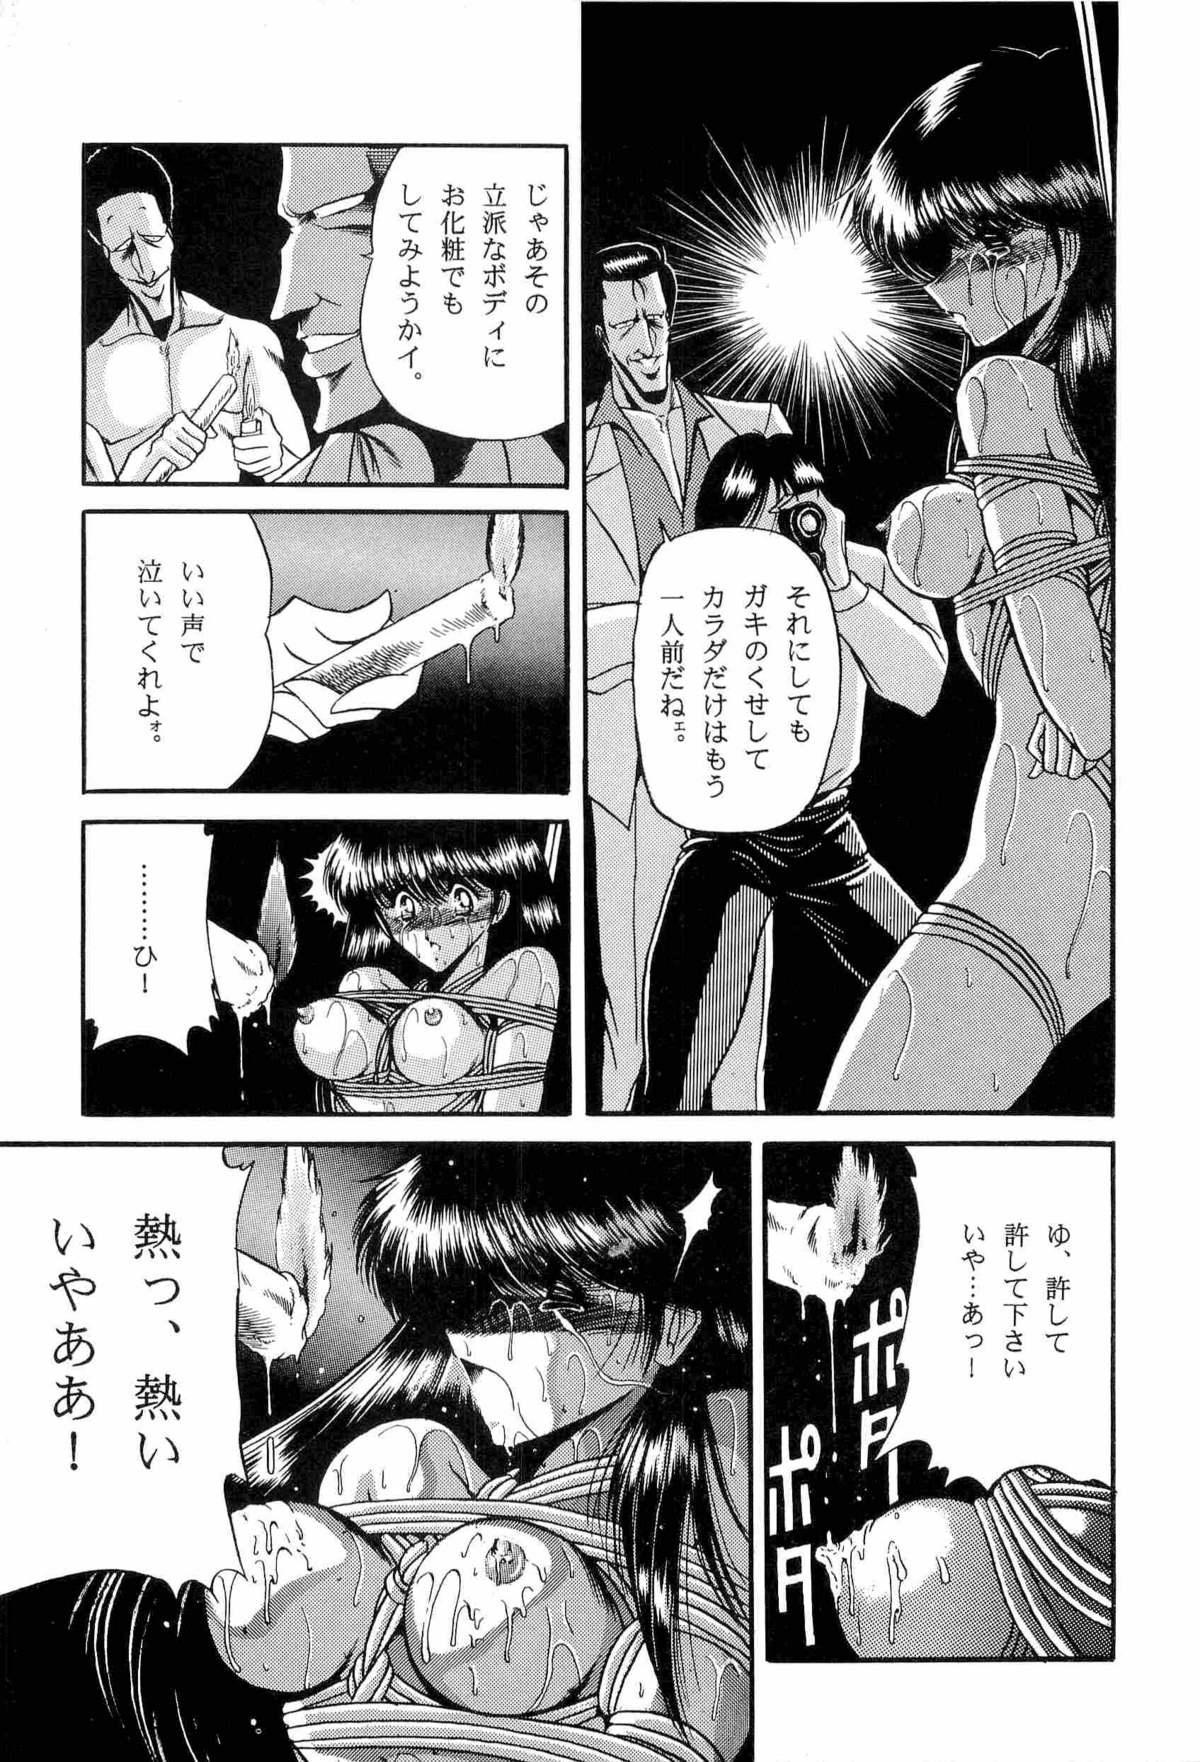 Bisyoujo Anthology '93 jyoukan 52